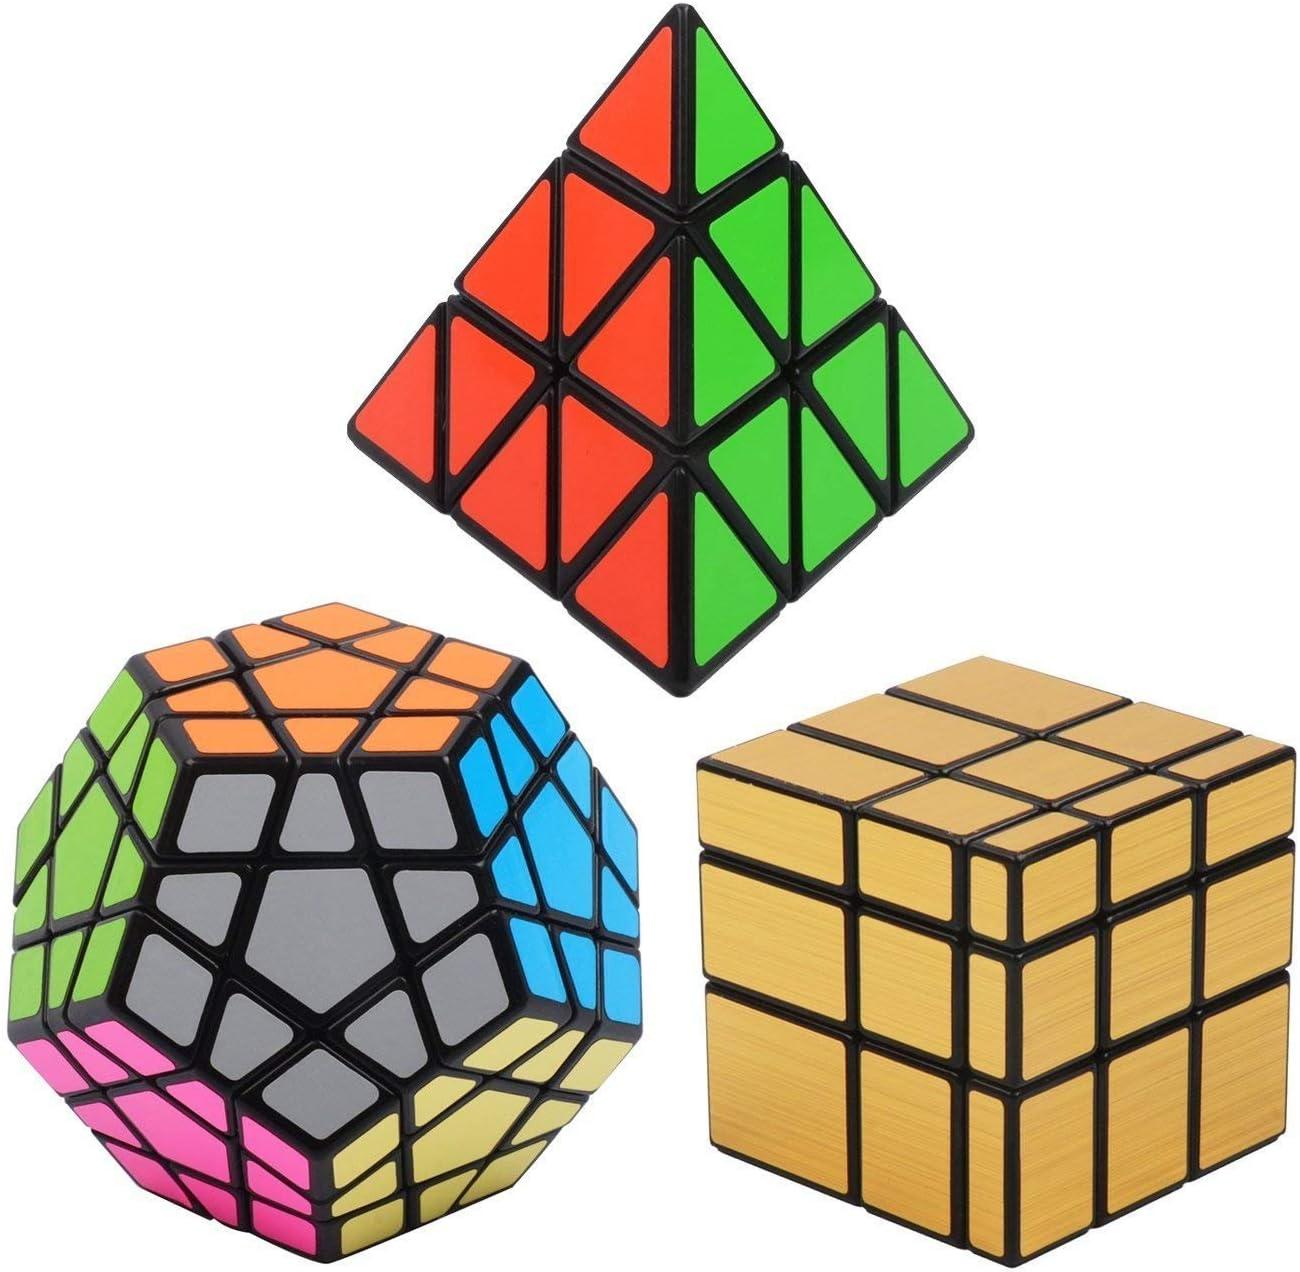 Vdealen Negro Magic Dodecahedron Megaminx + 3 x 3 x 3 Pyramid + 3 ...